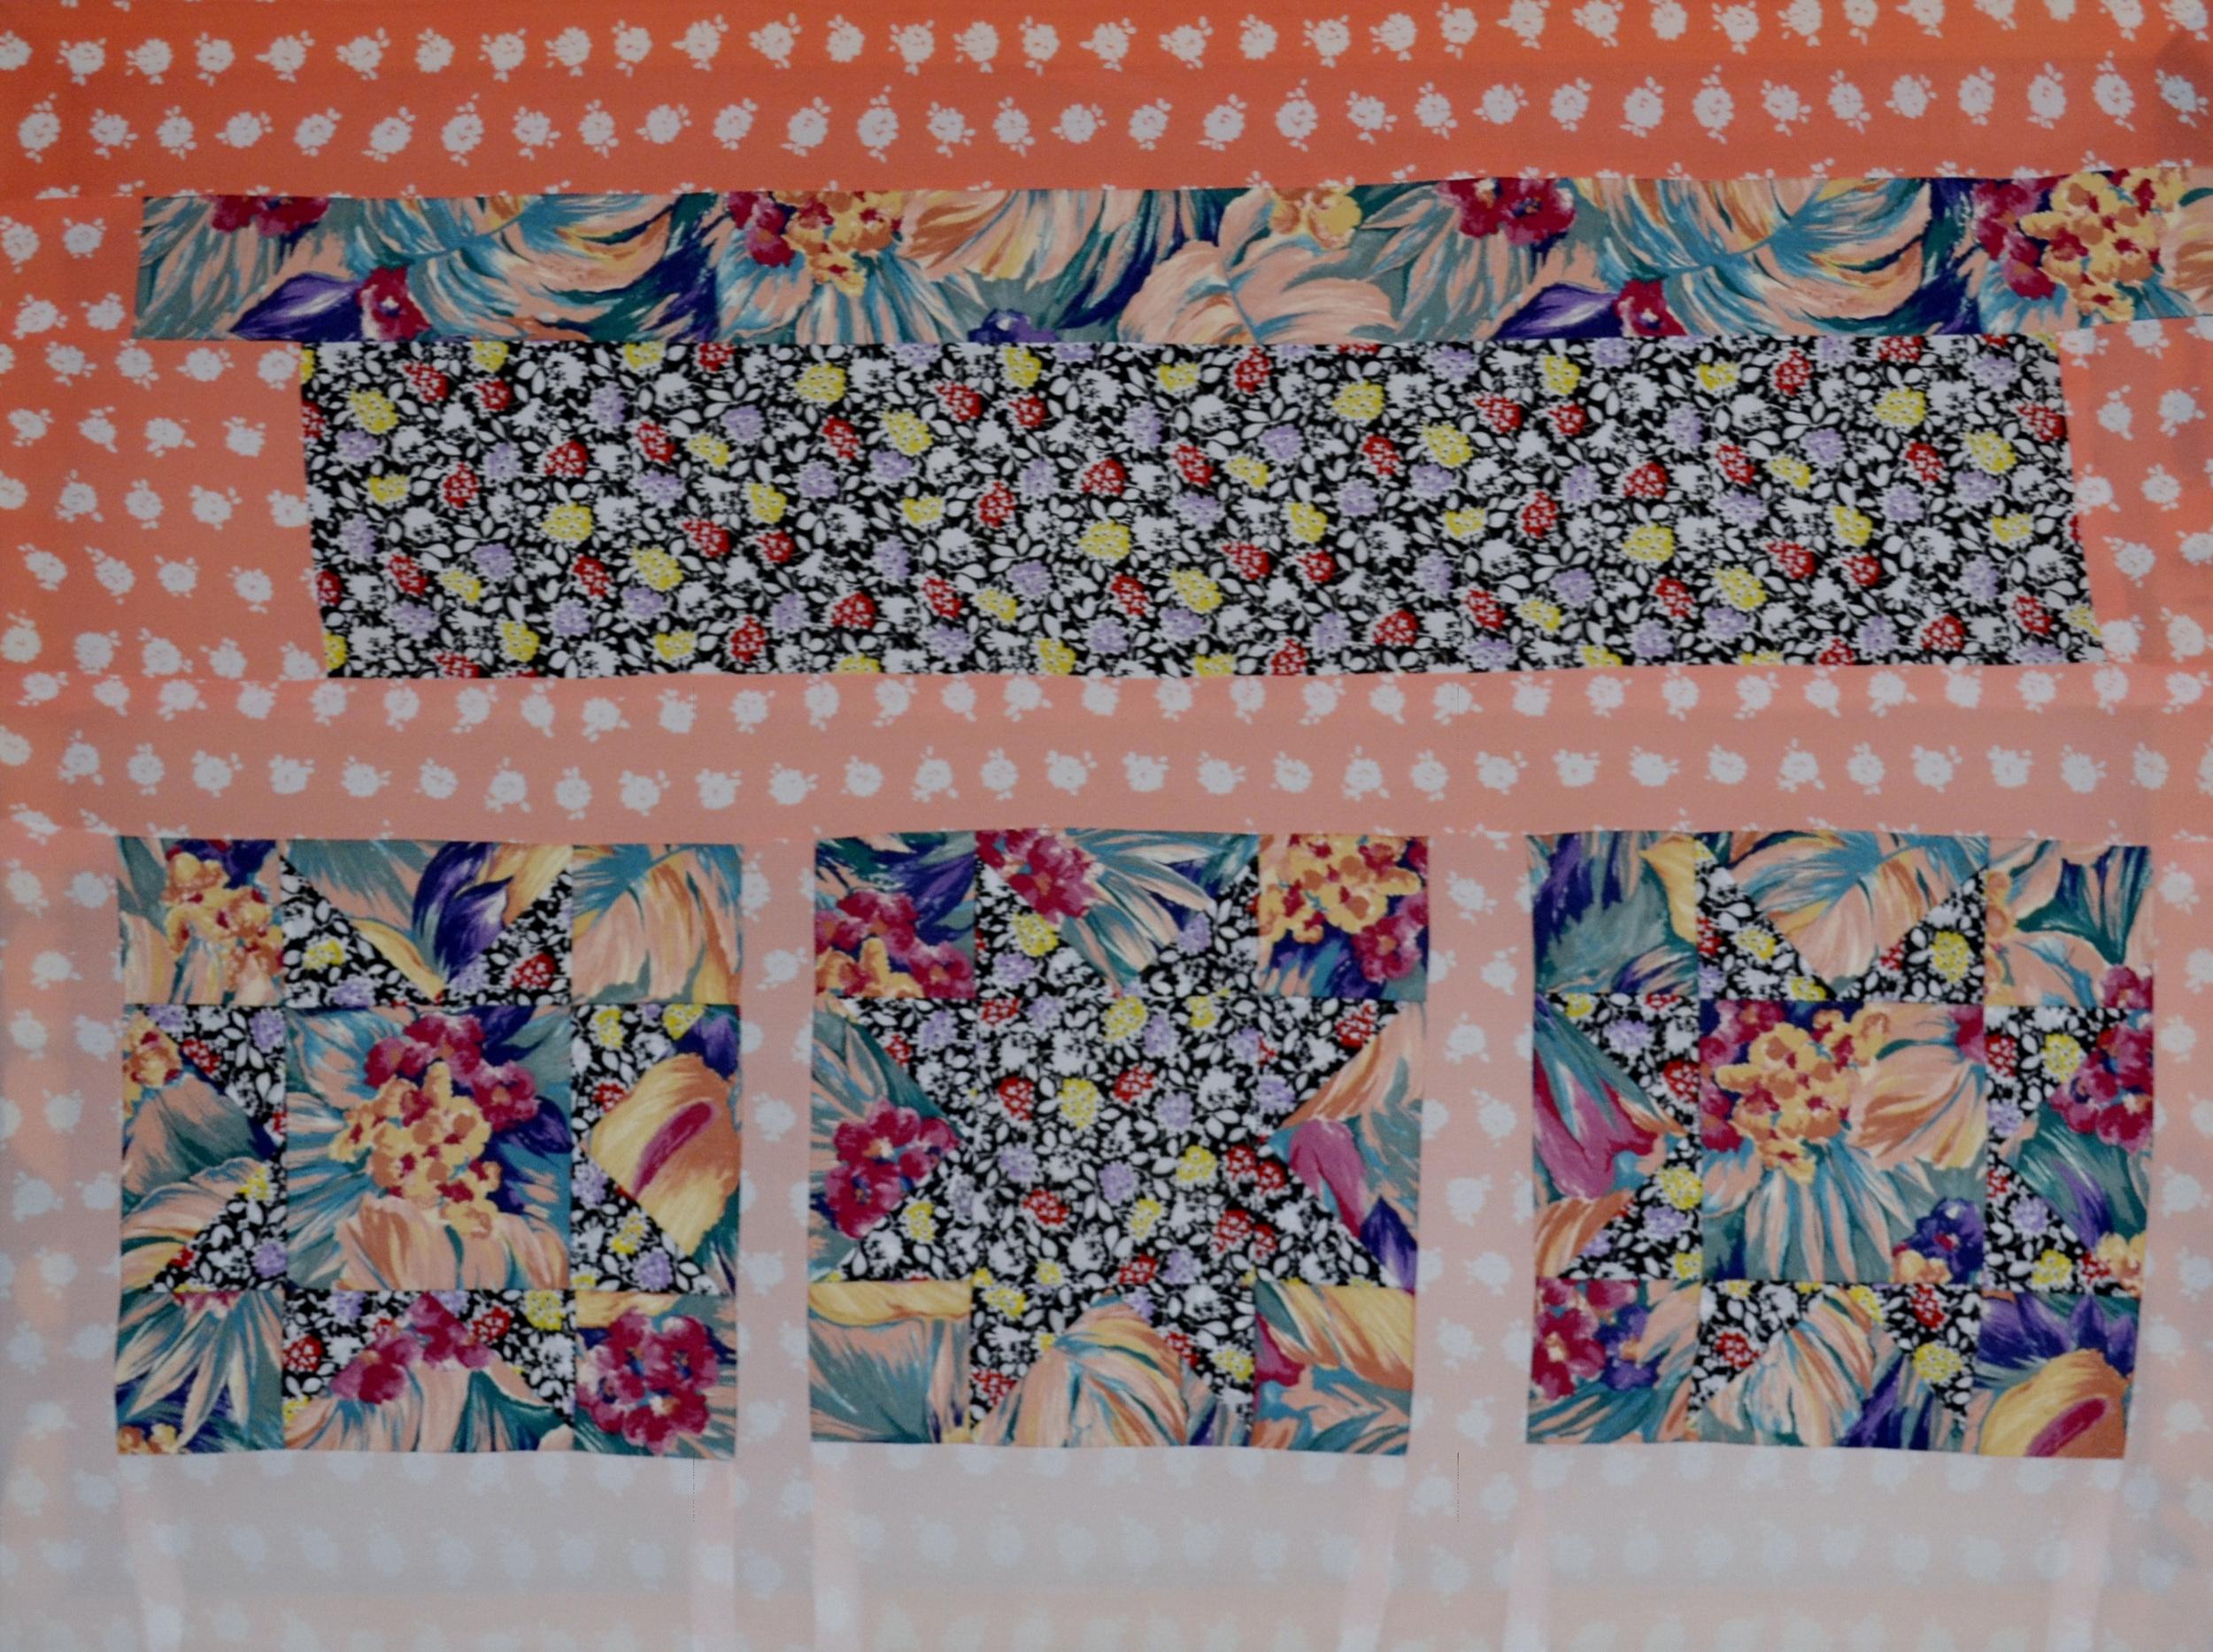 The Jungle Line   , 2011 sewn fabric 36 x 52 inches  Private Collection, Pennsylvania